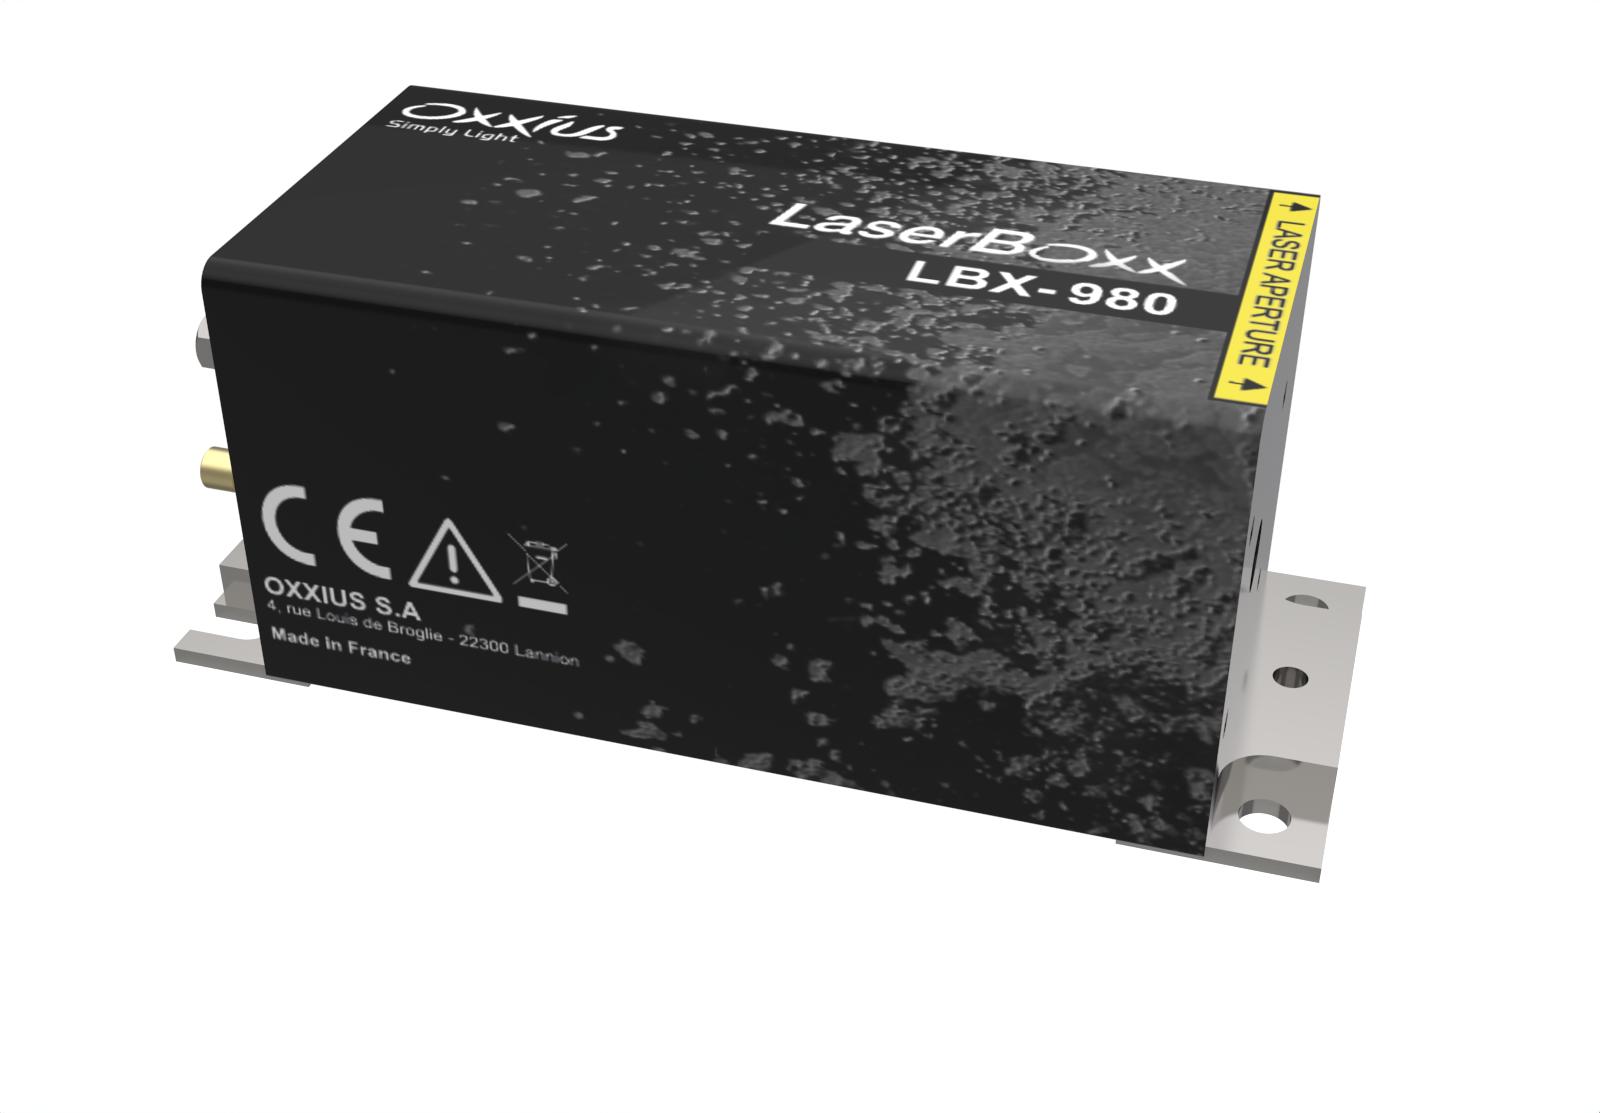 LBX-980-200-CSB: 980nm Laser Diode Module